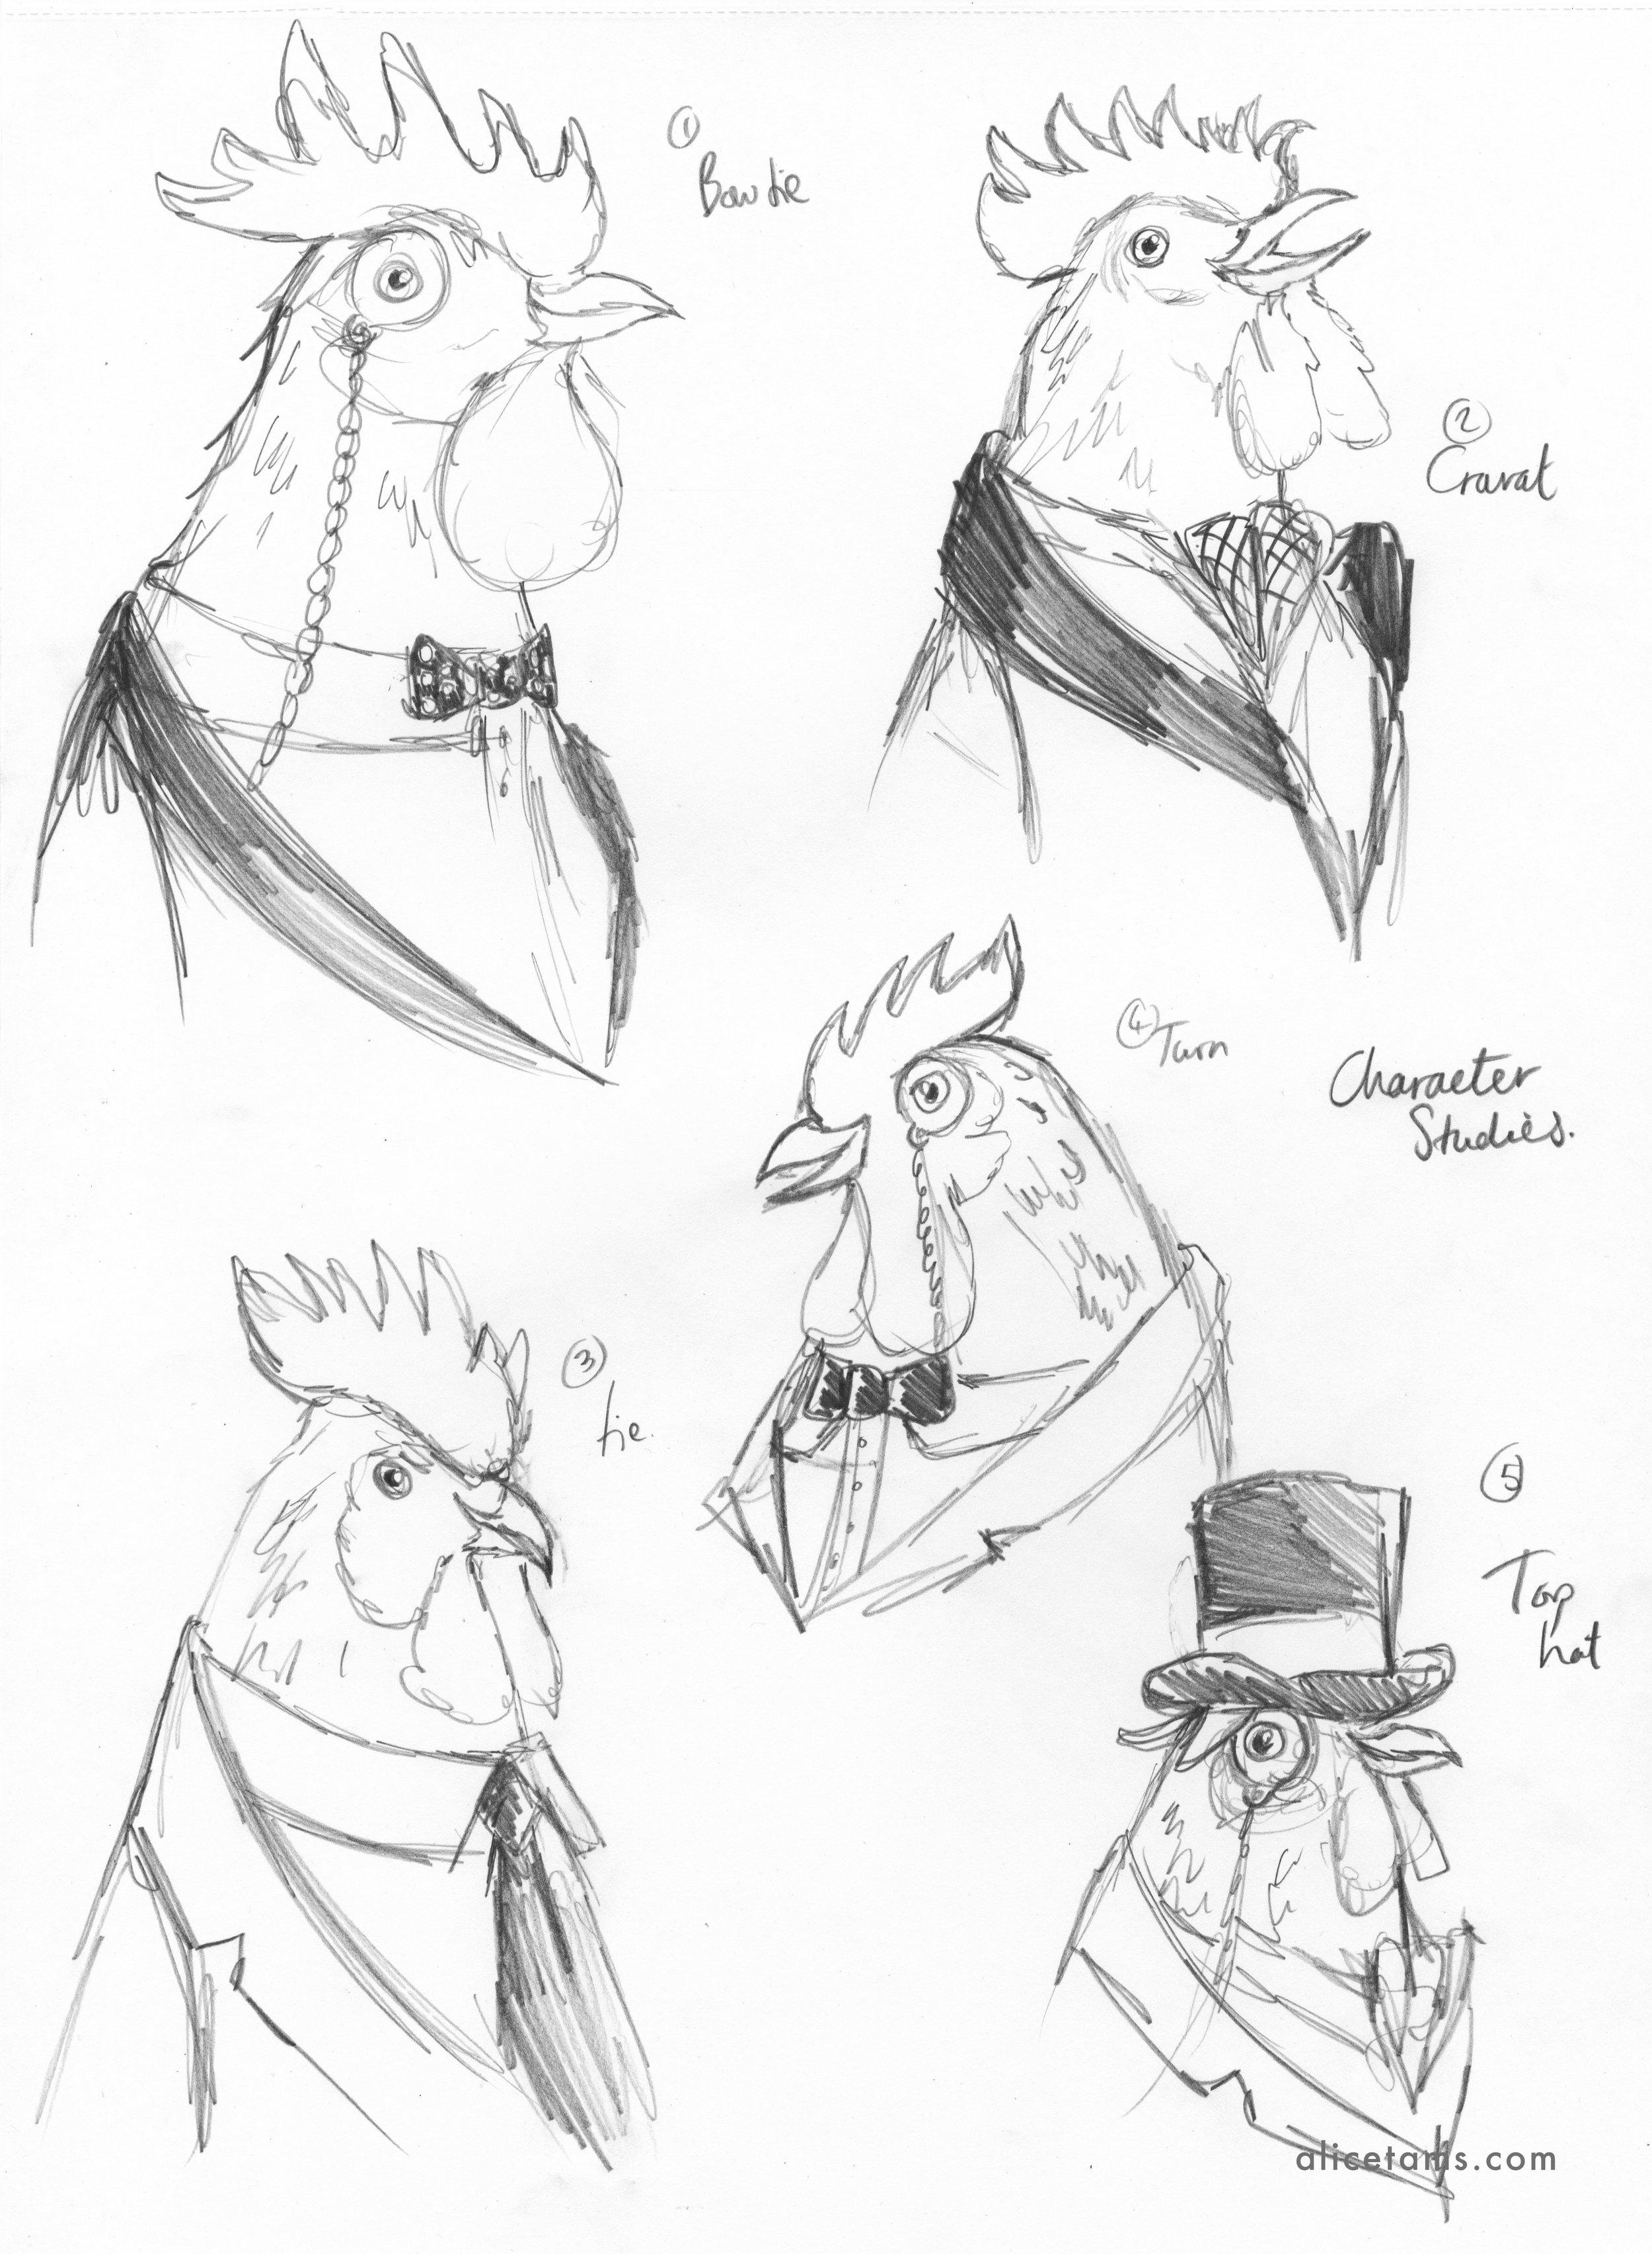 Character studies copy.jpg